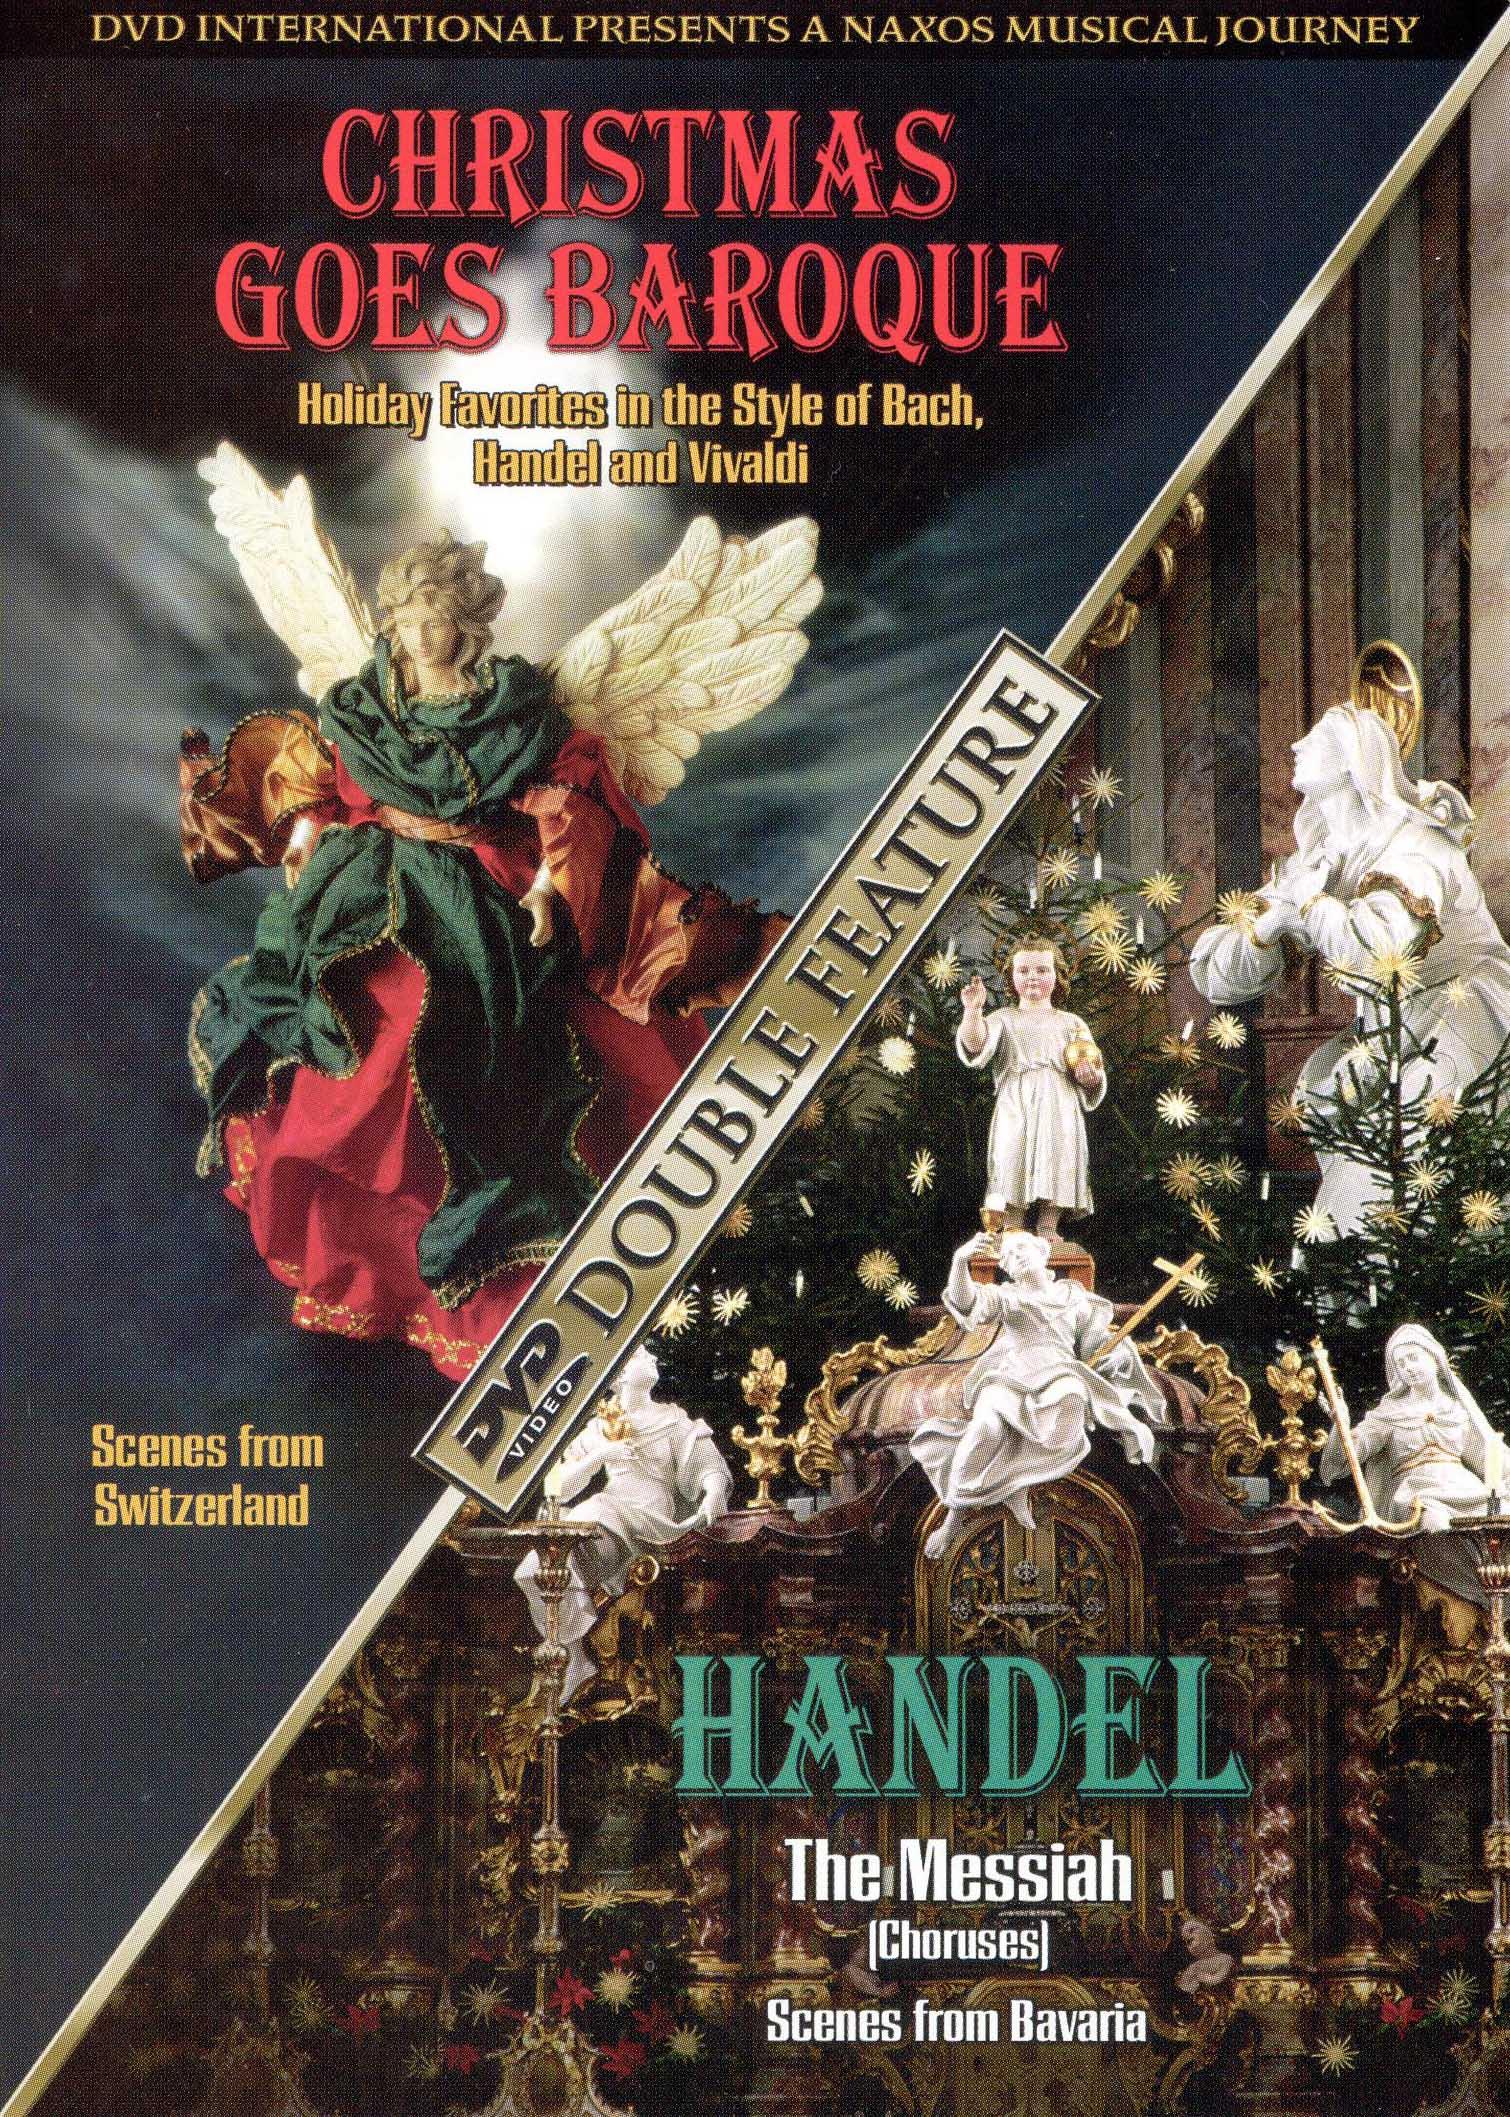 A Naxos Musical Journey: Christmas Goes Baroque - Messiah Choruses